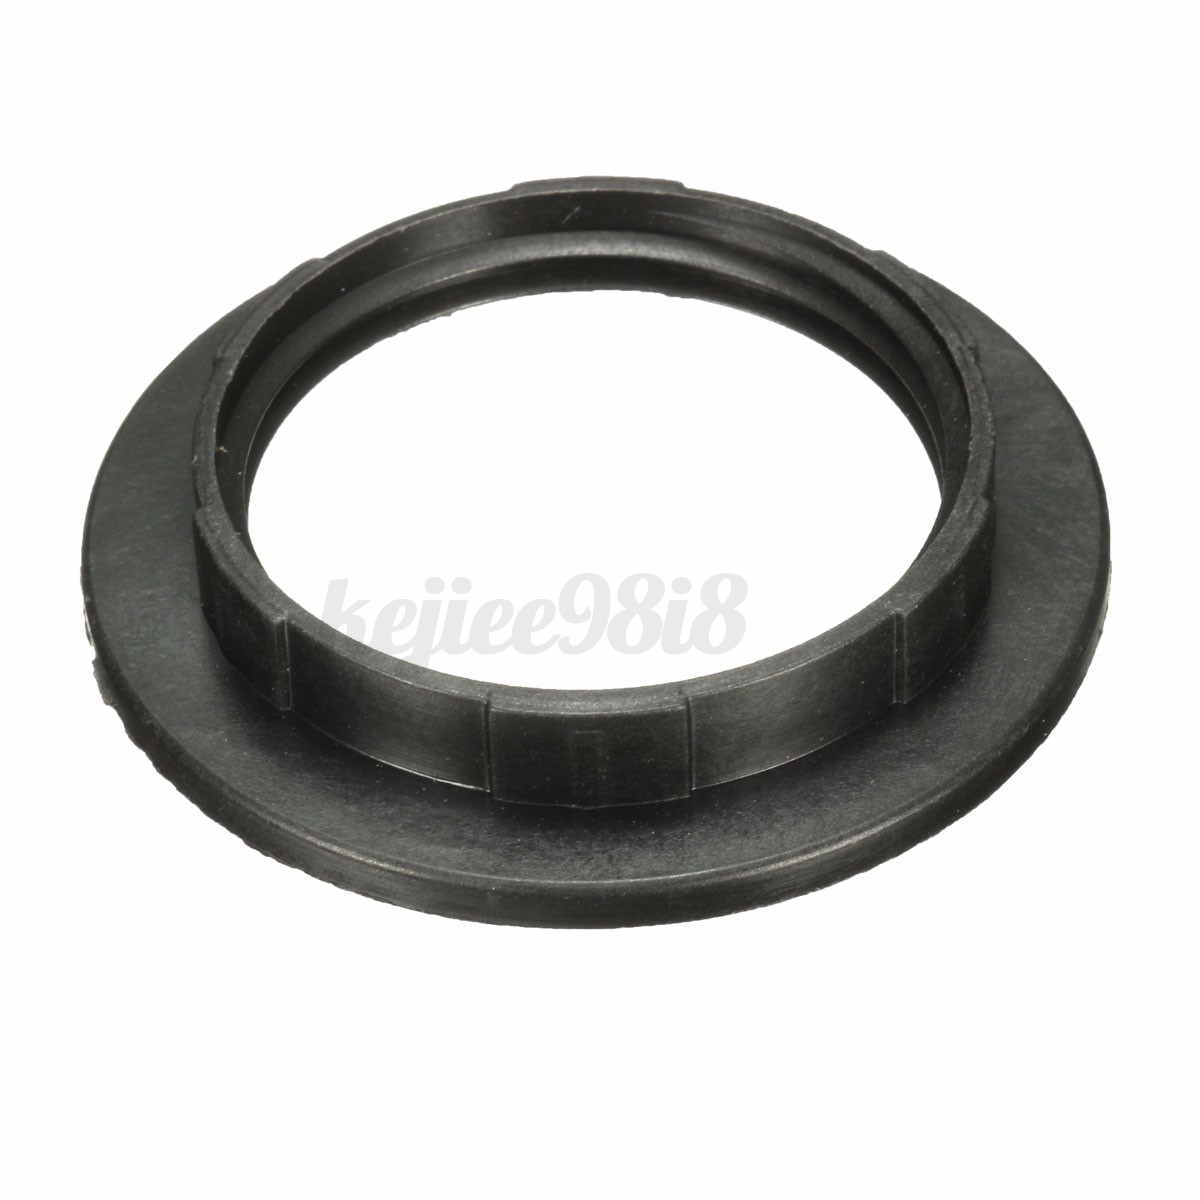 Black White E27 Screw Lampshade Light Shade Collar Ring